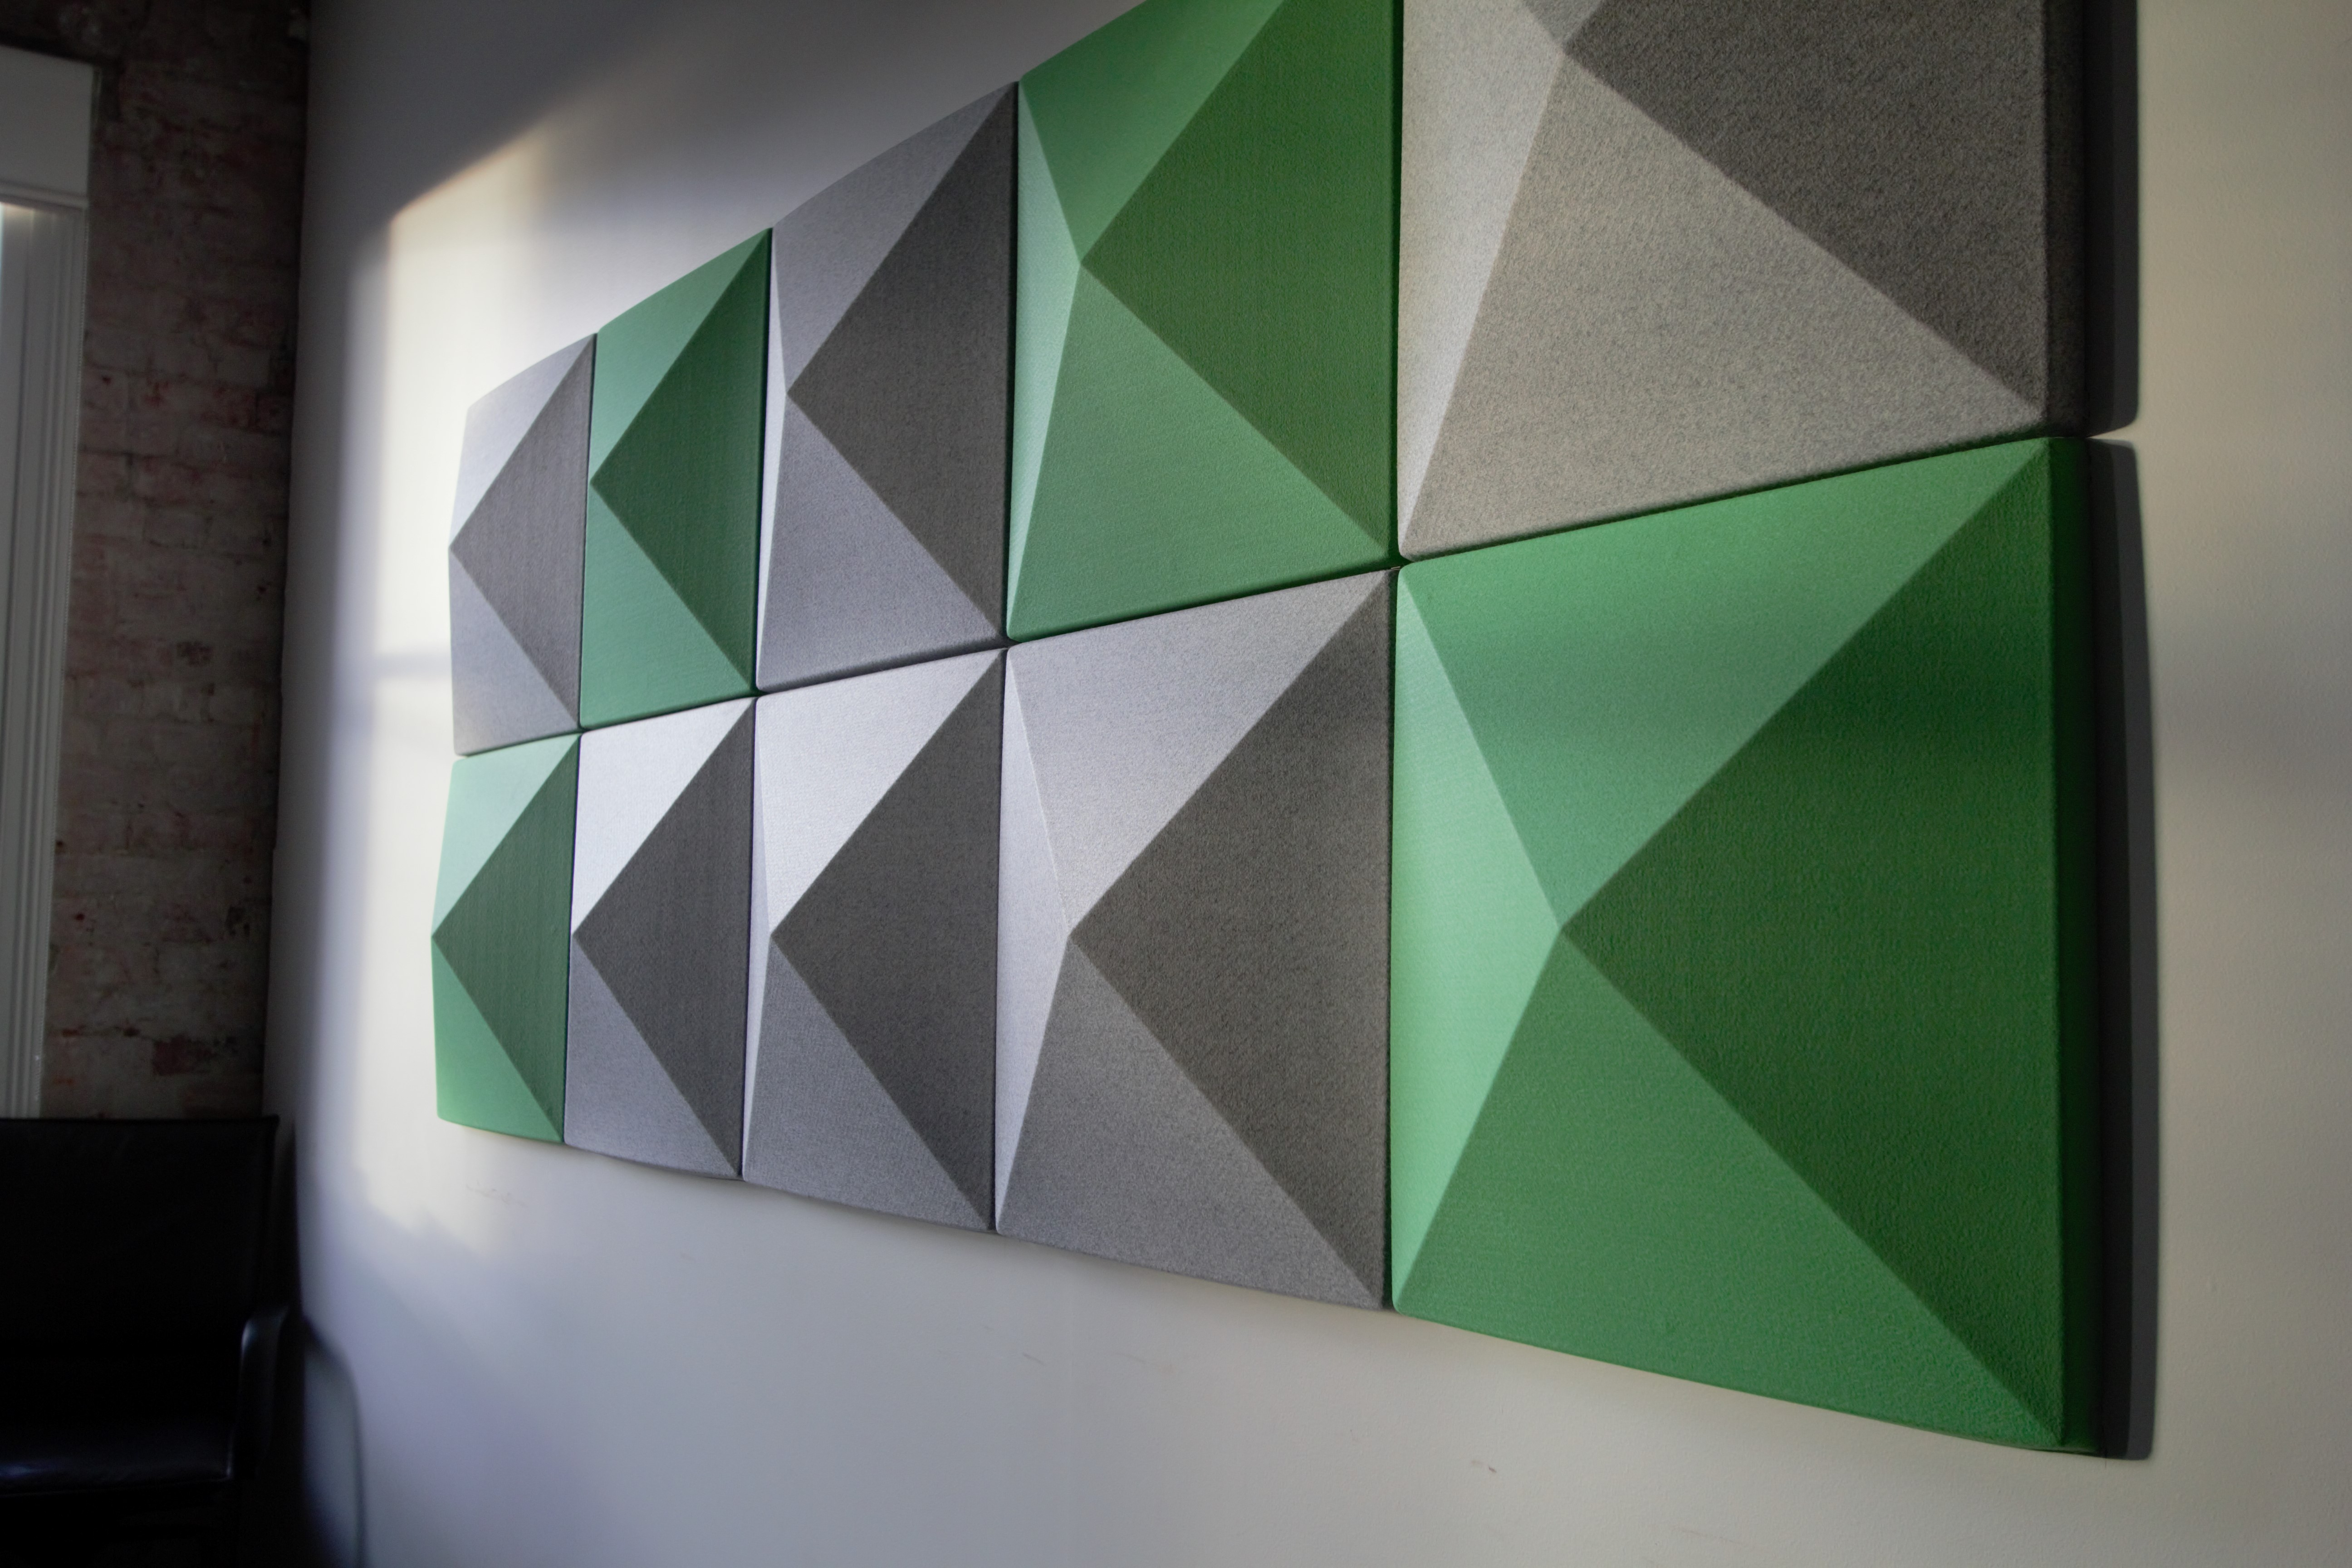 Kathmandu Office: Series 5 - 37 Acoustic 3D Wall Tiles